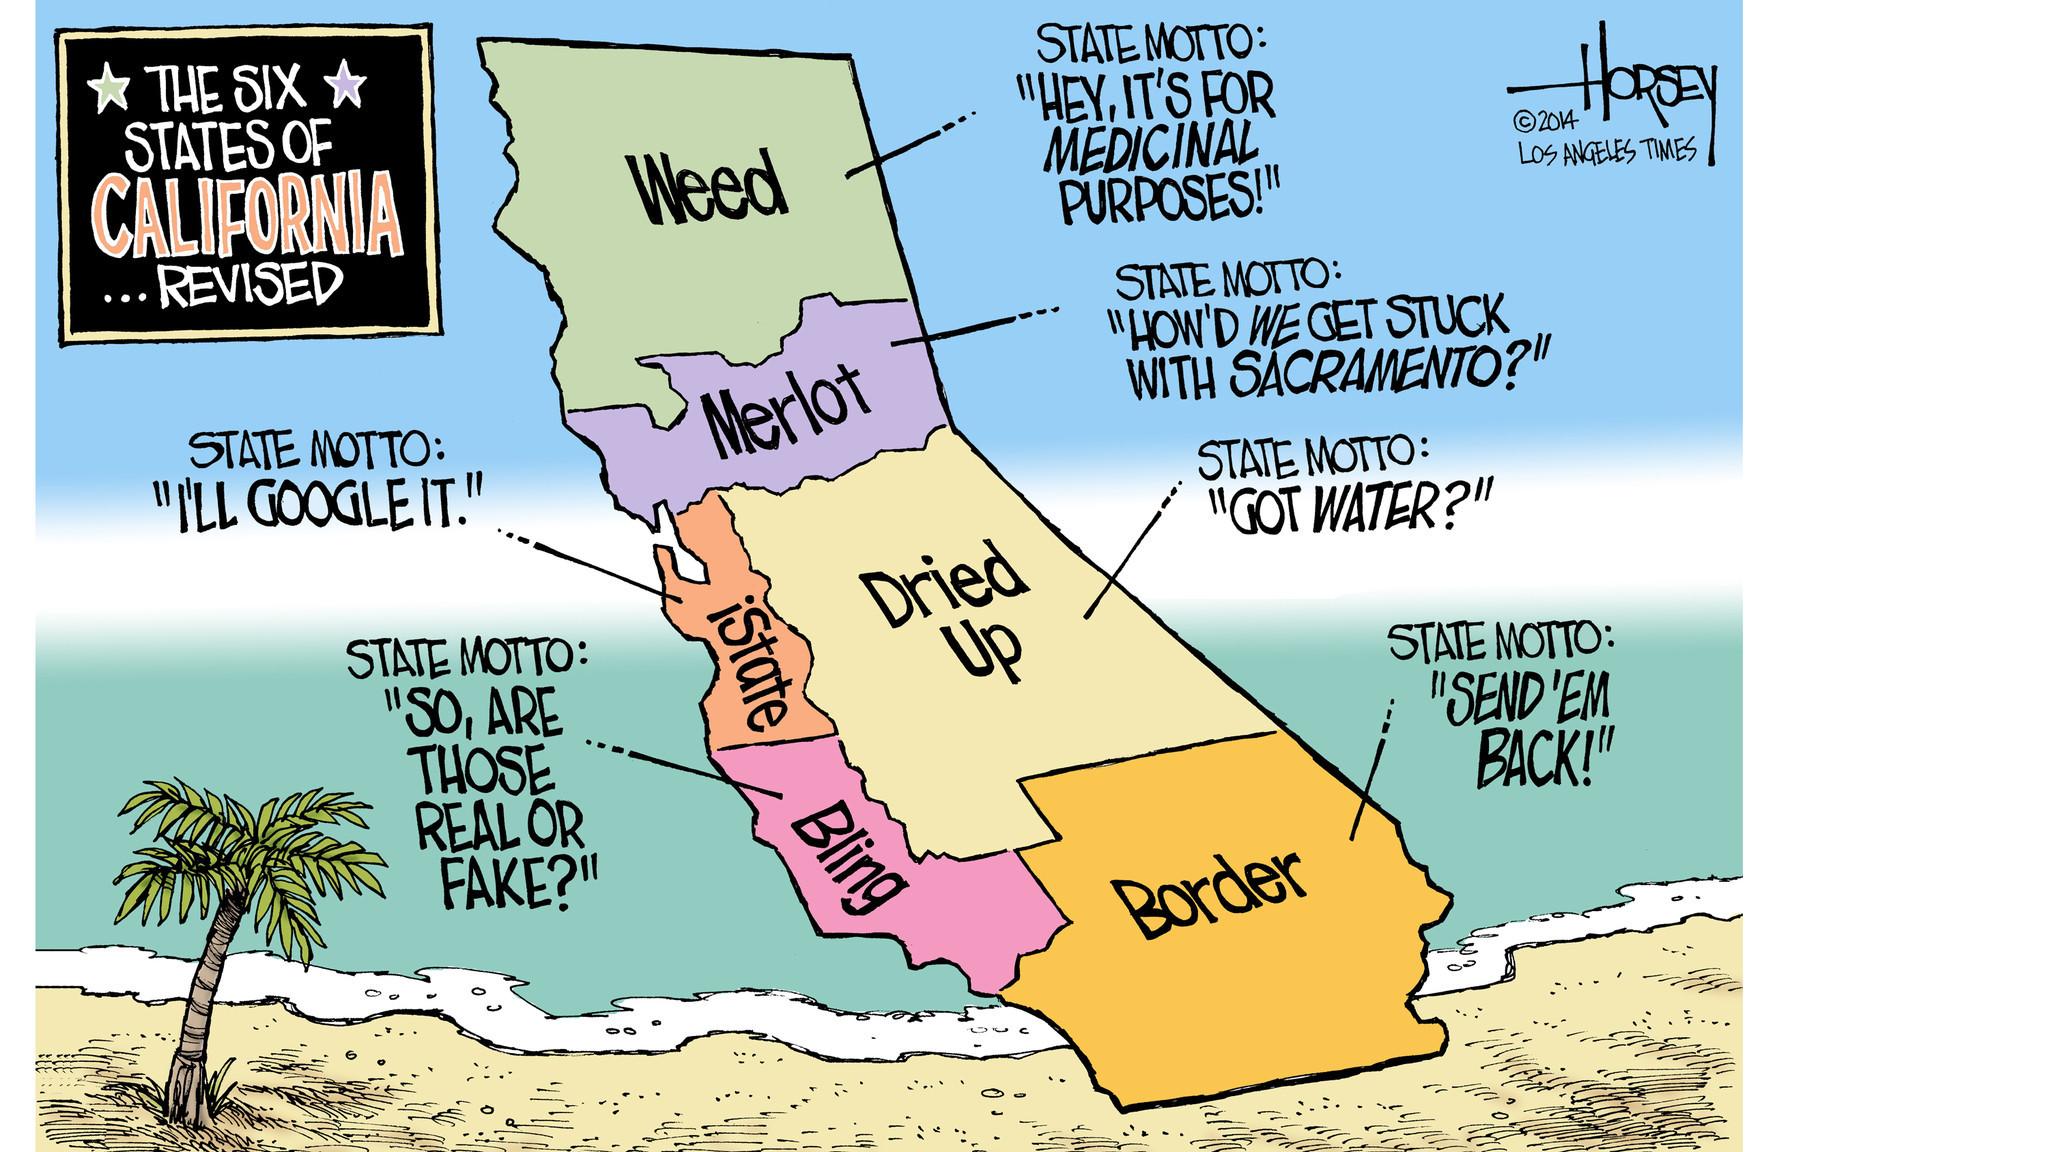 Small States, big problems